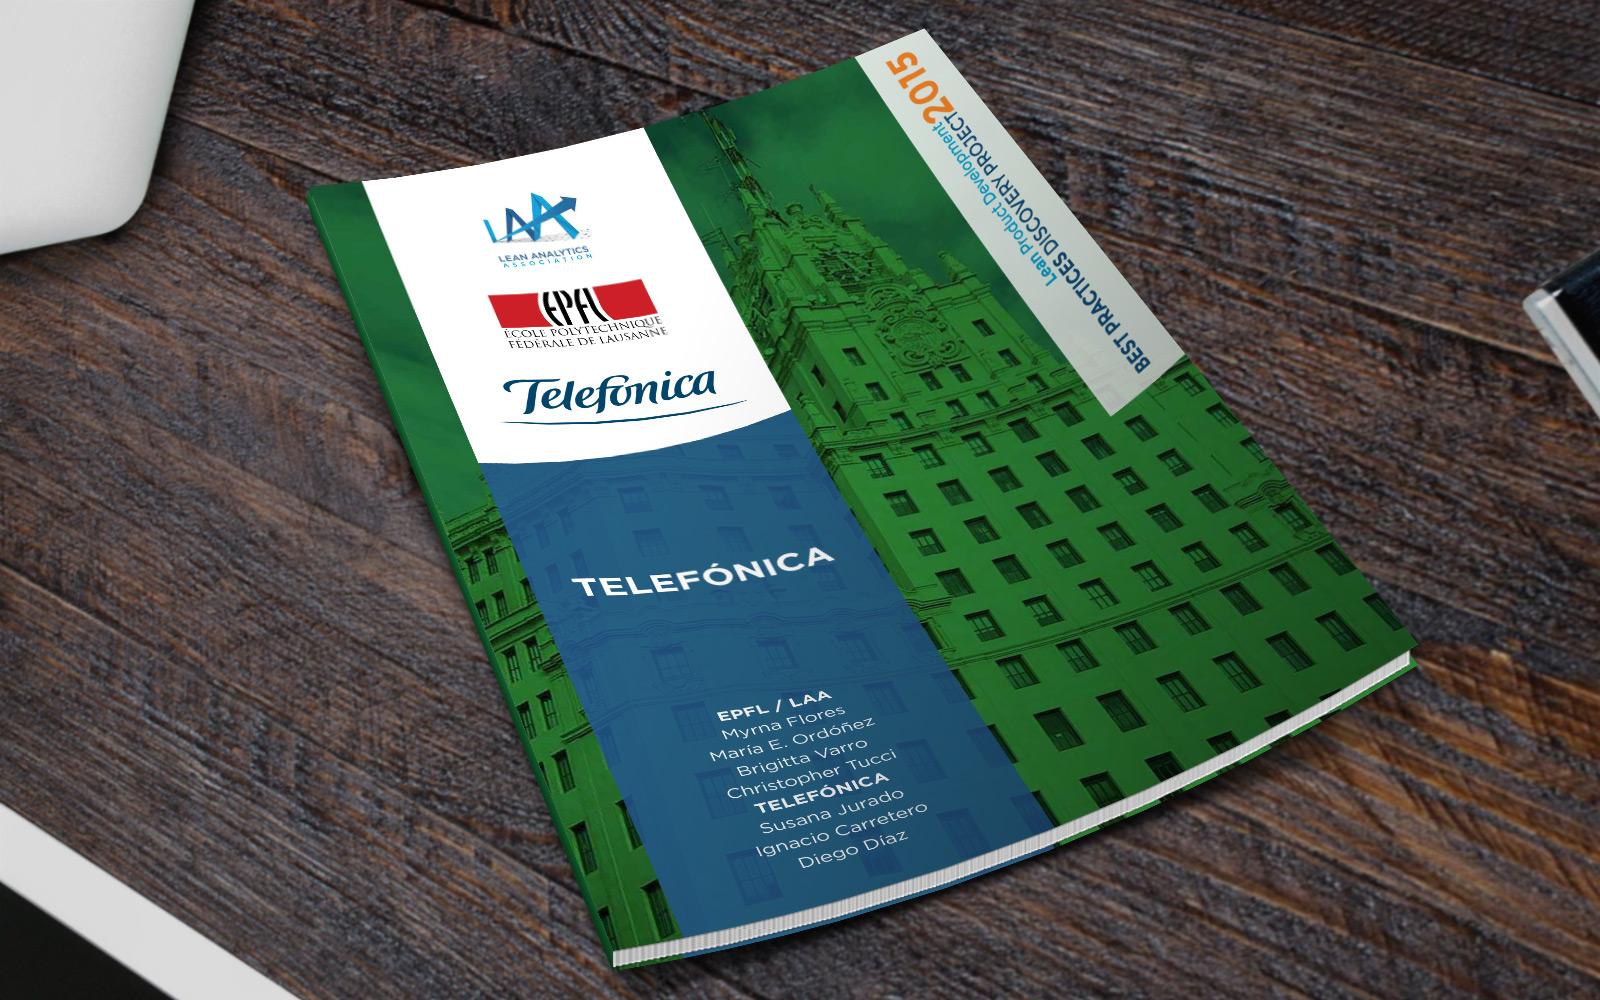 laa-library_cases-telefonica-en